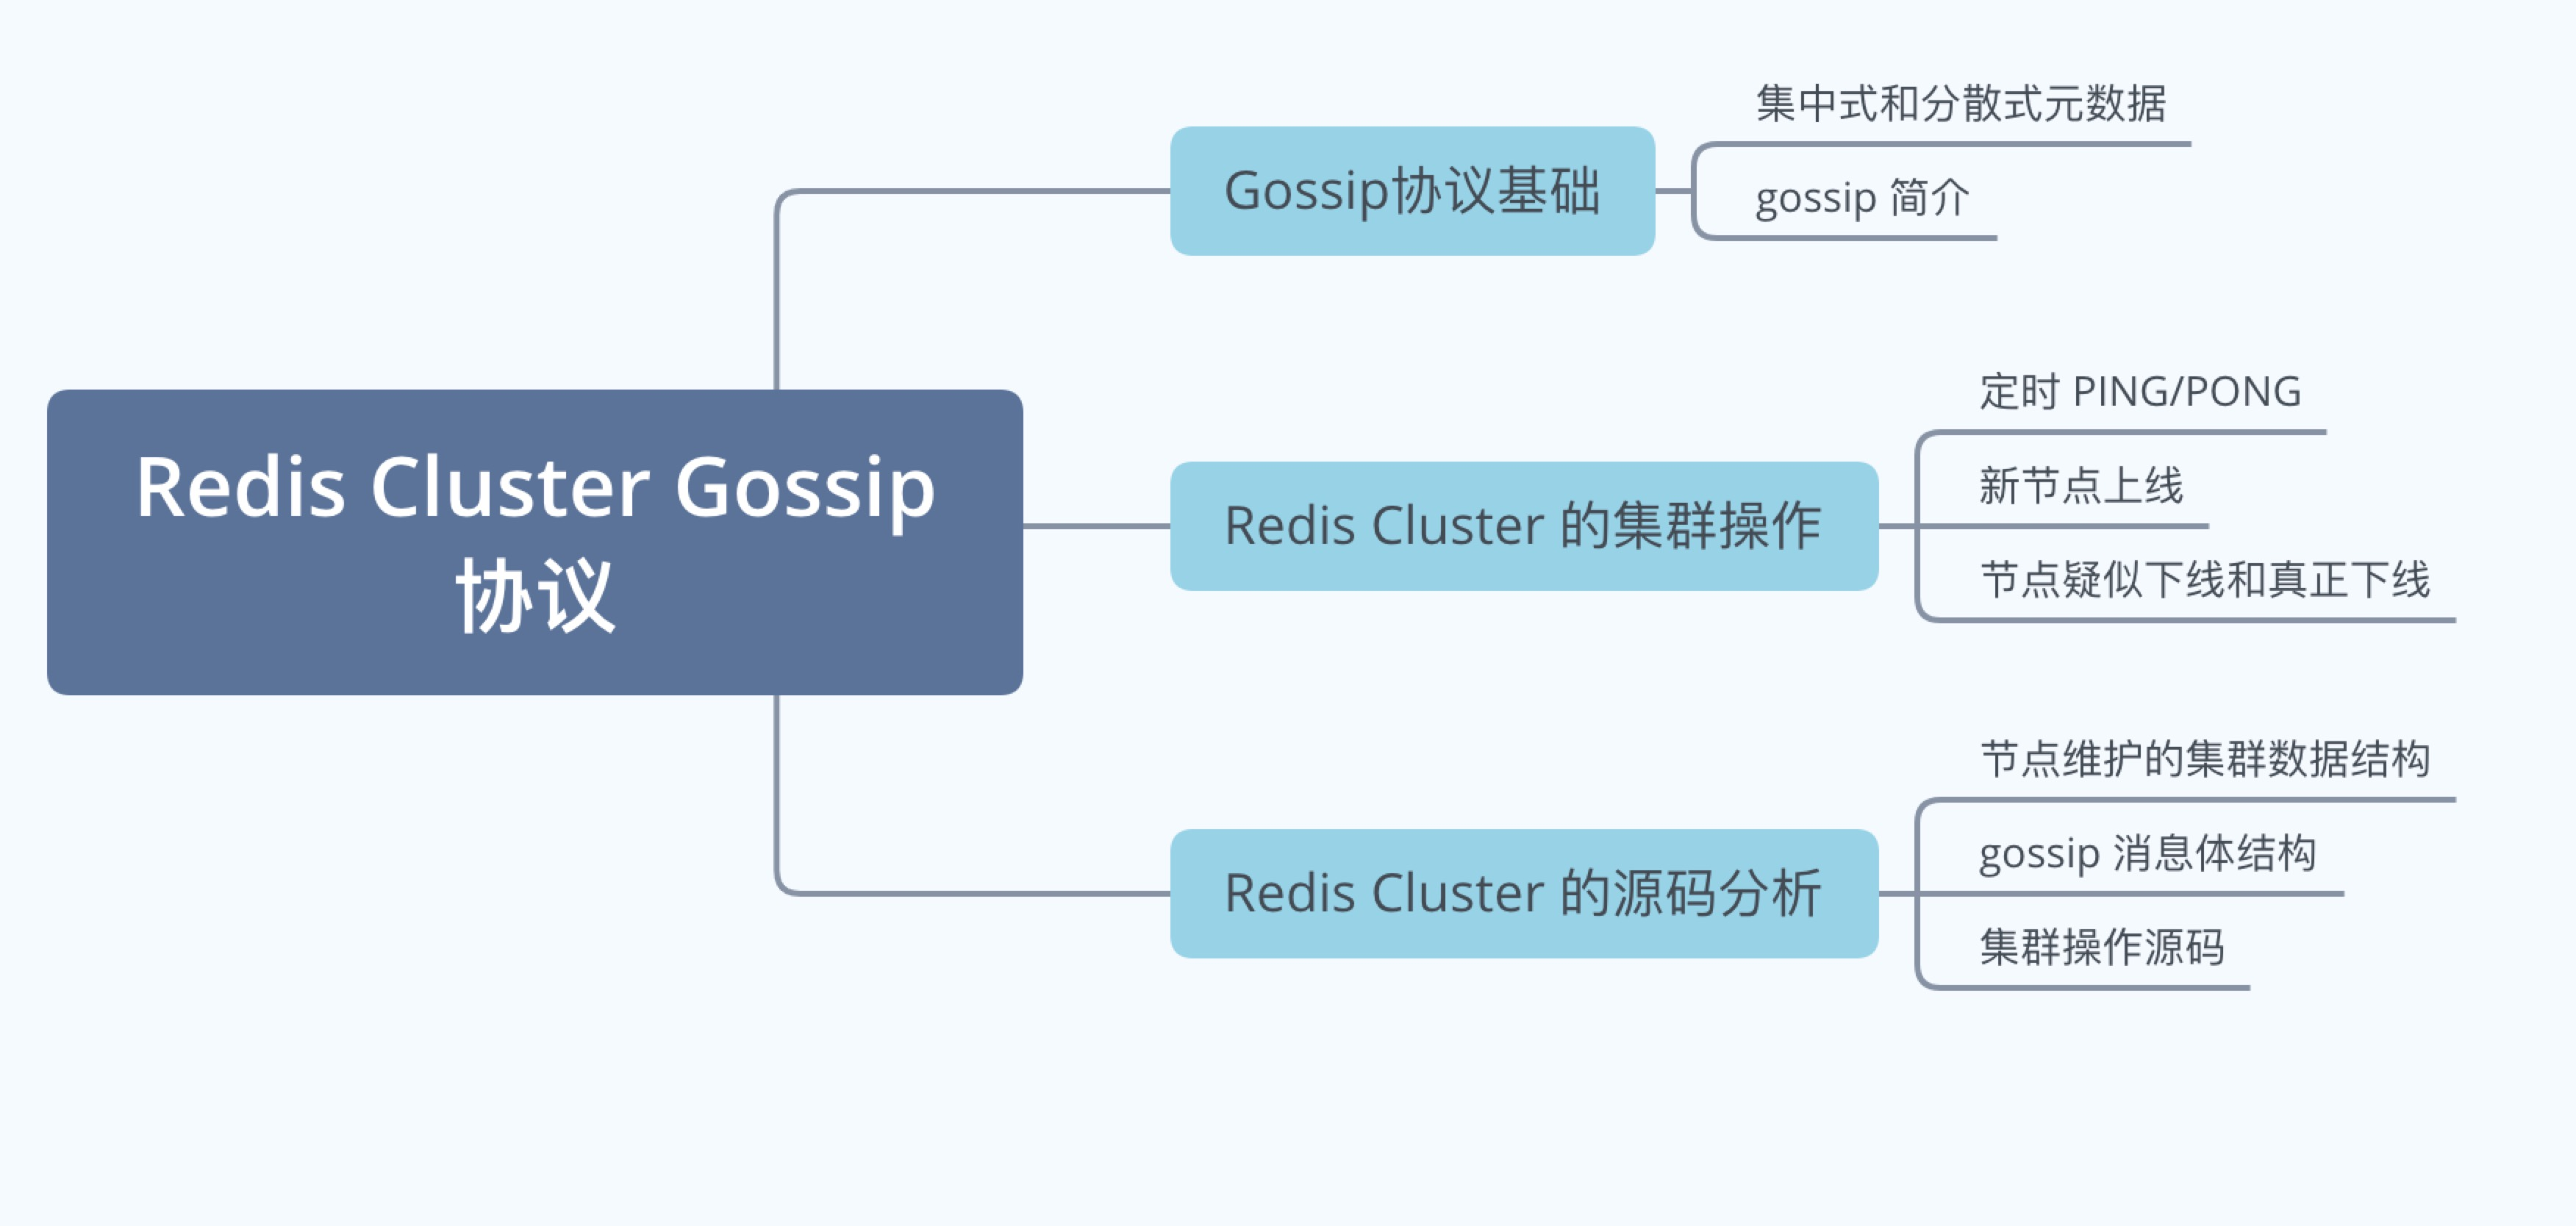 一万字详解 Redis Cluster Gossip 协议